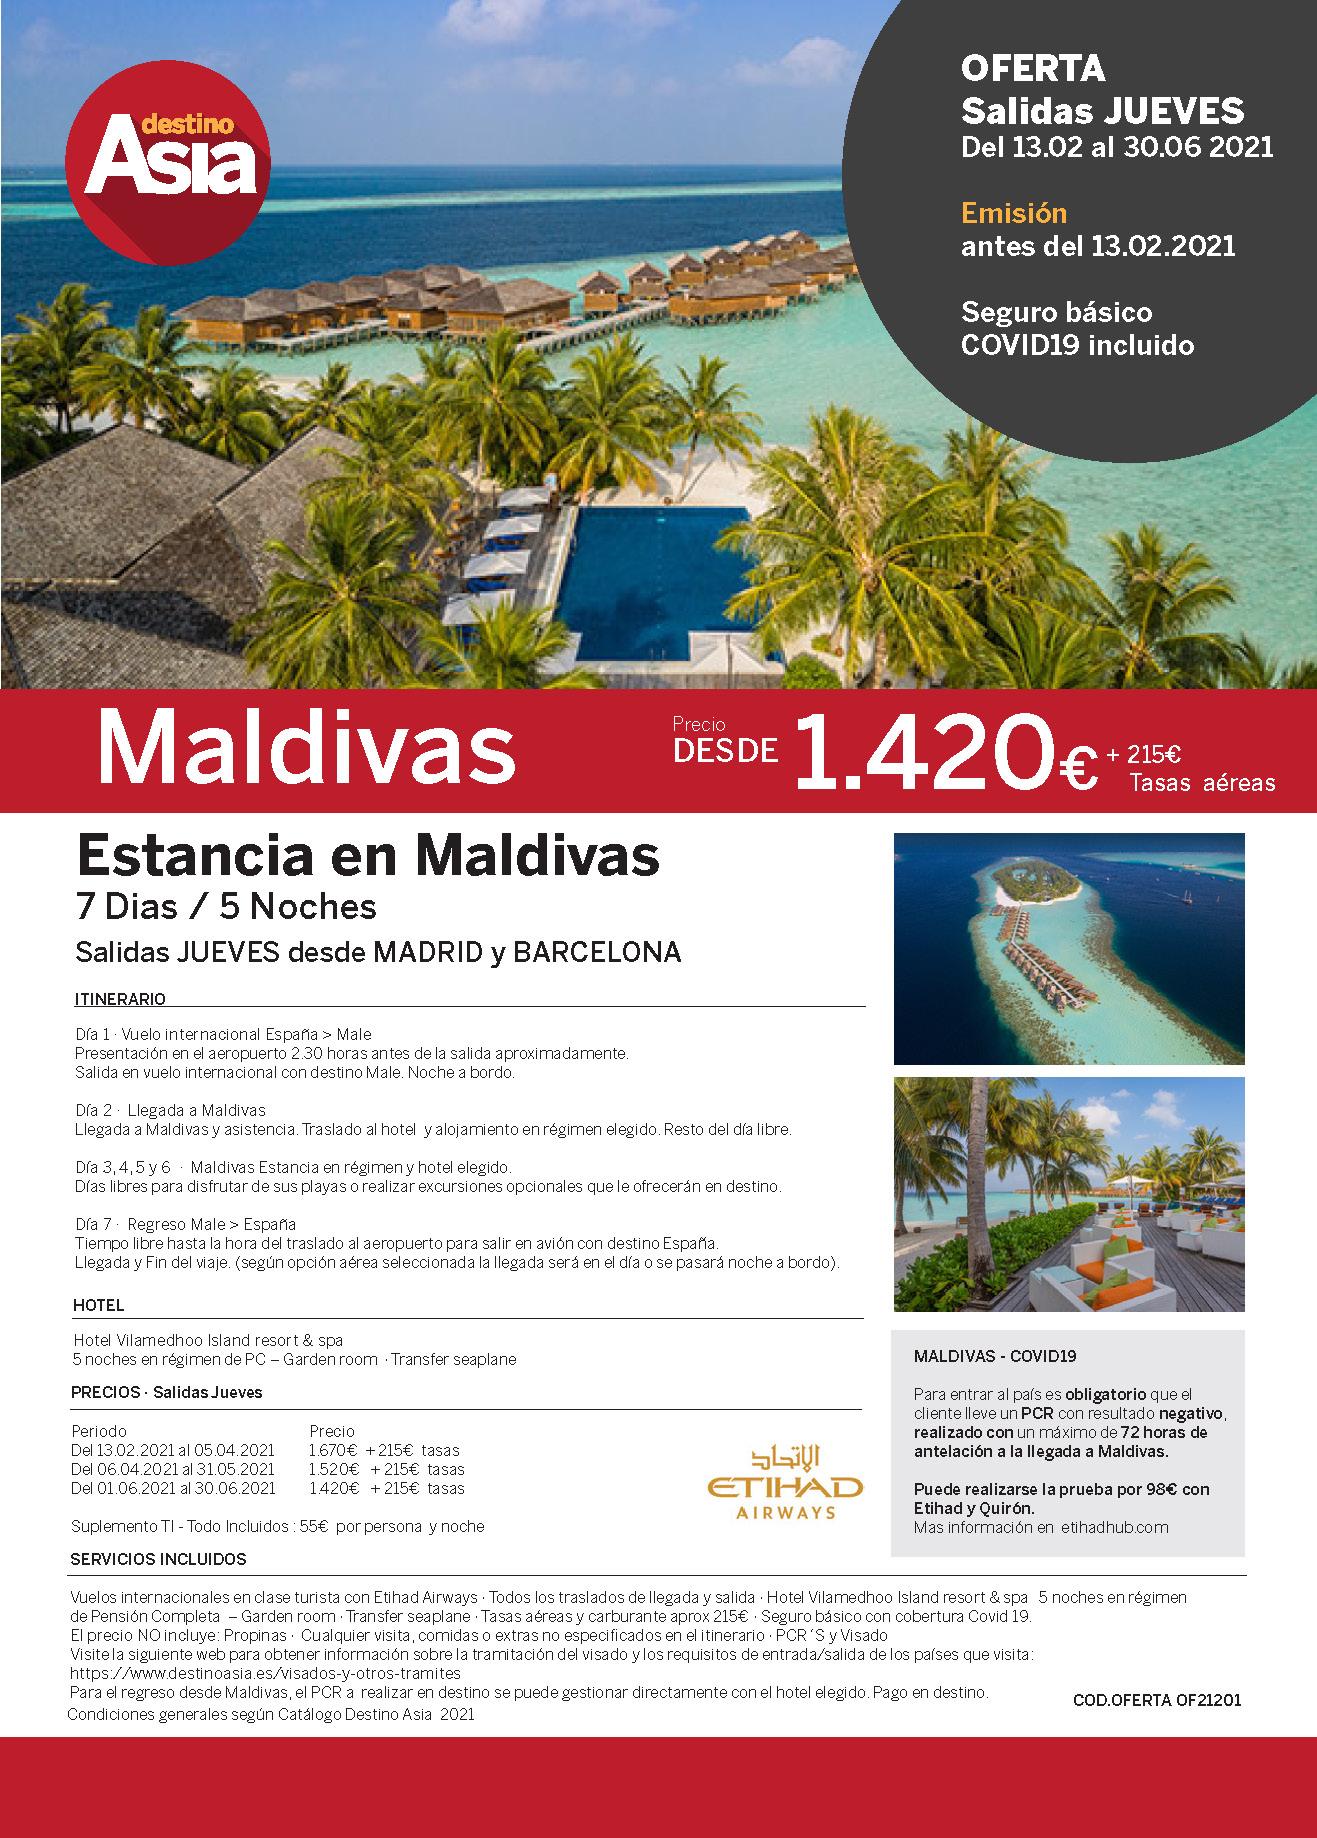 Oferta Ultima Hora Destino Asia Estancia en Maldivas 2021